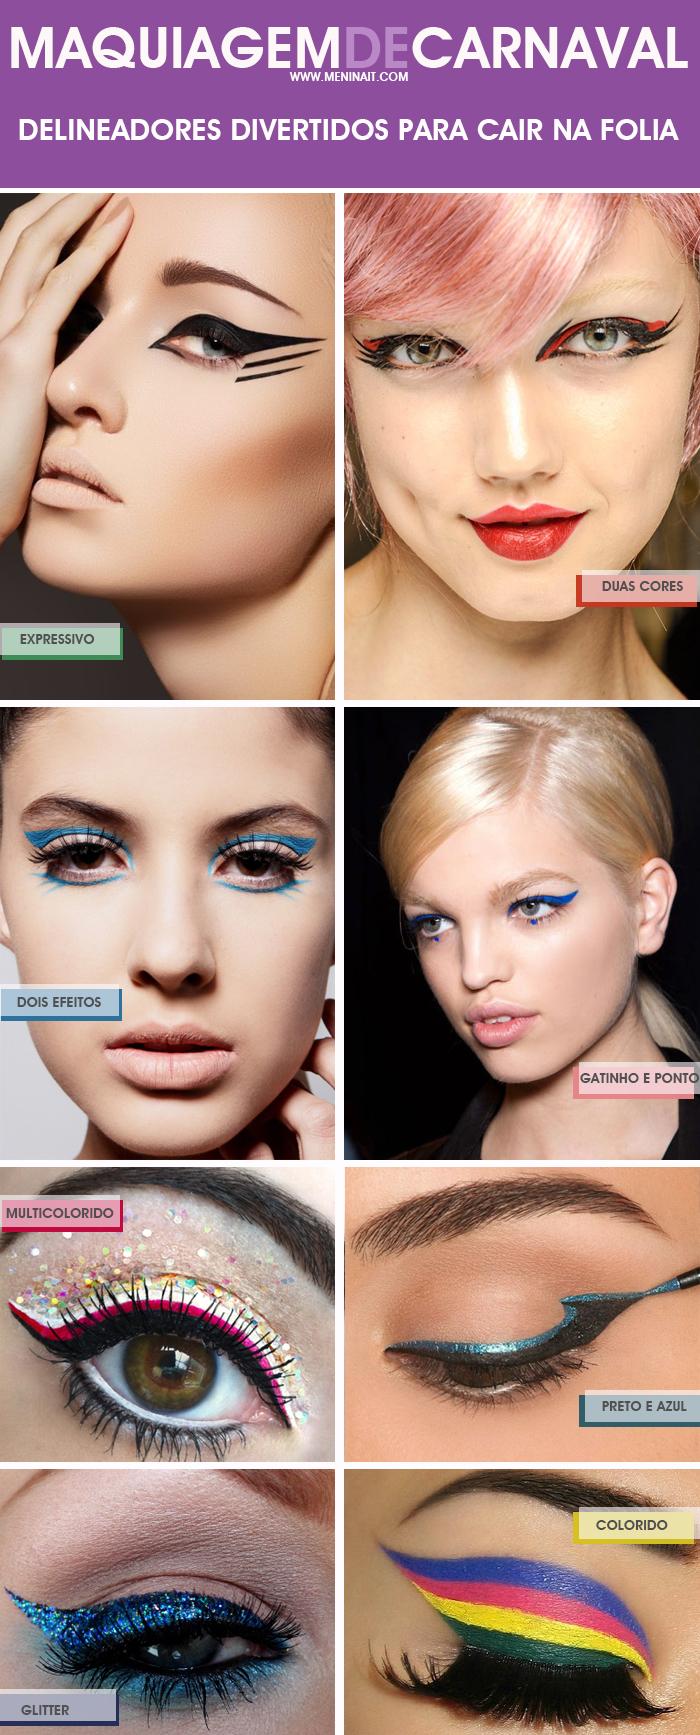 Maquiagem Carnaval 2013